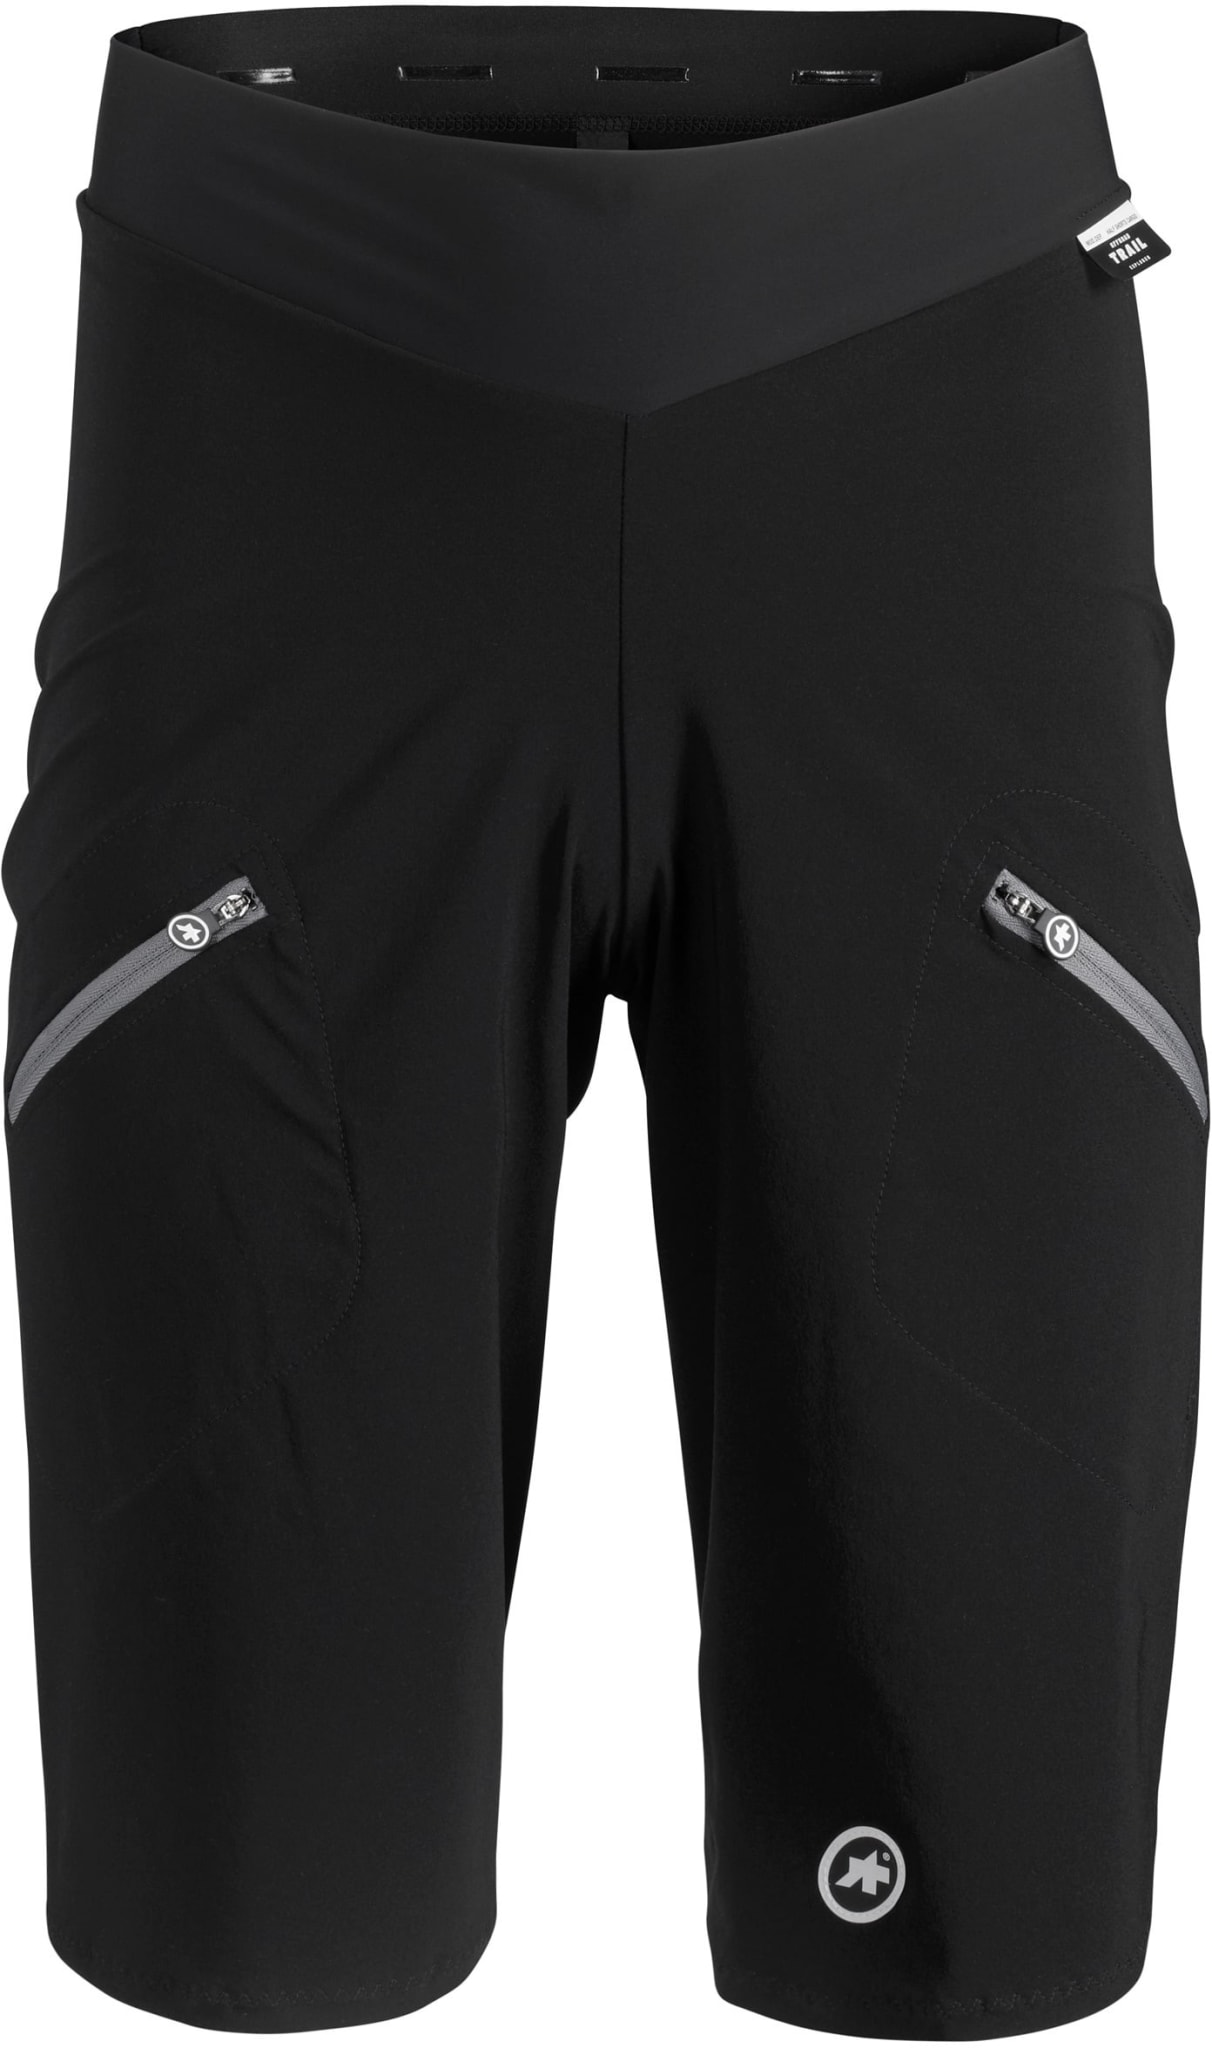 Nydelig shorts for terrenget, med en løs følese - men god passform